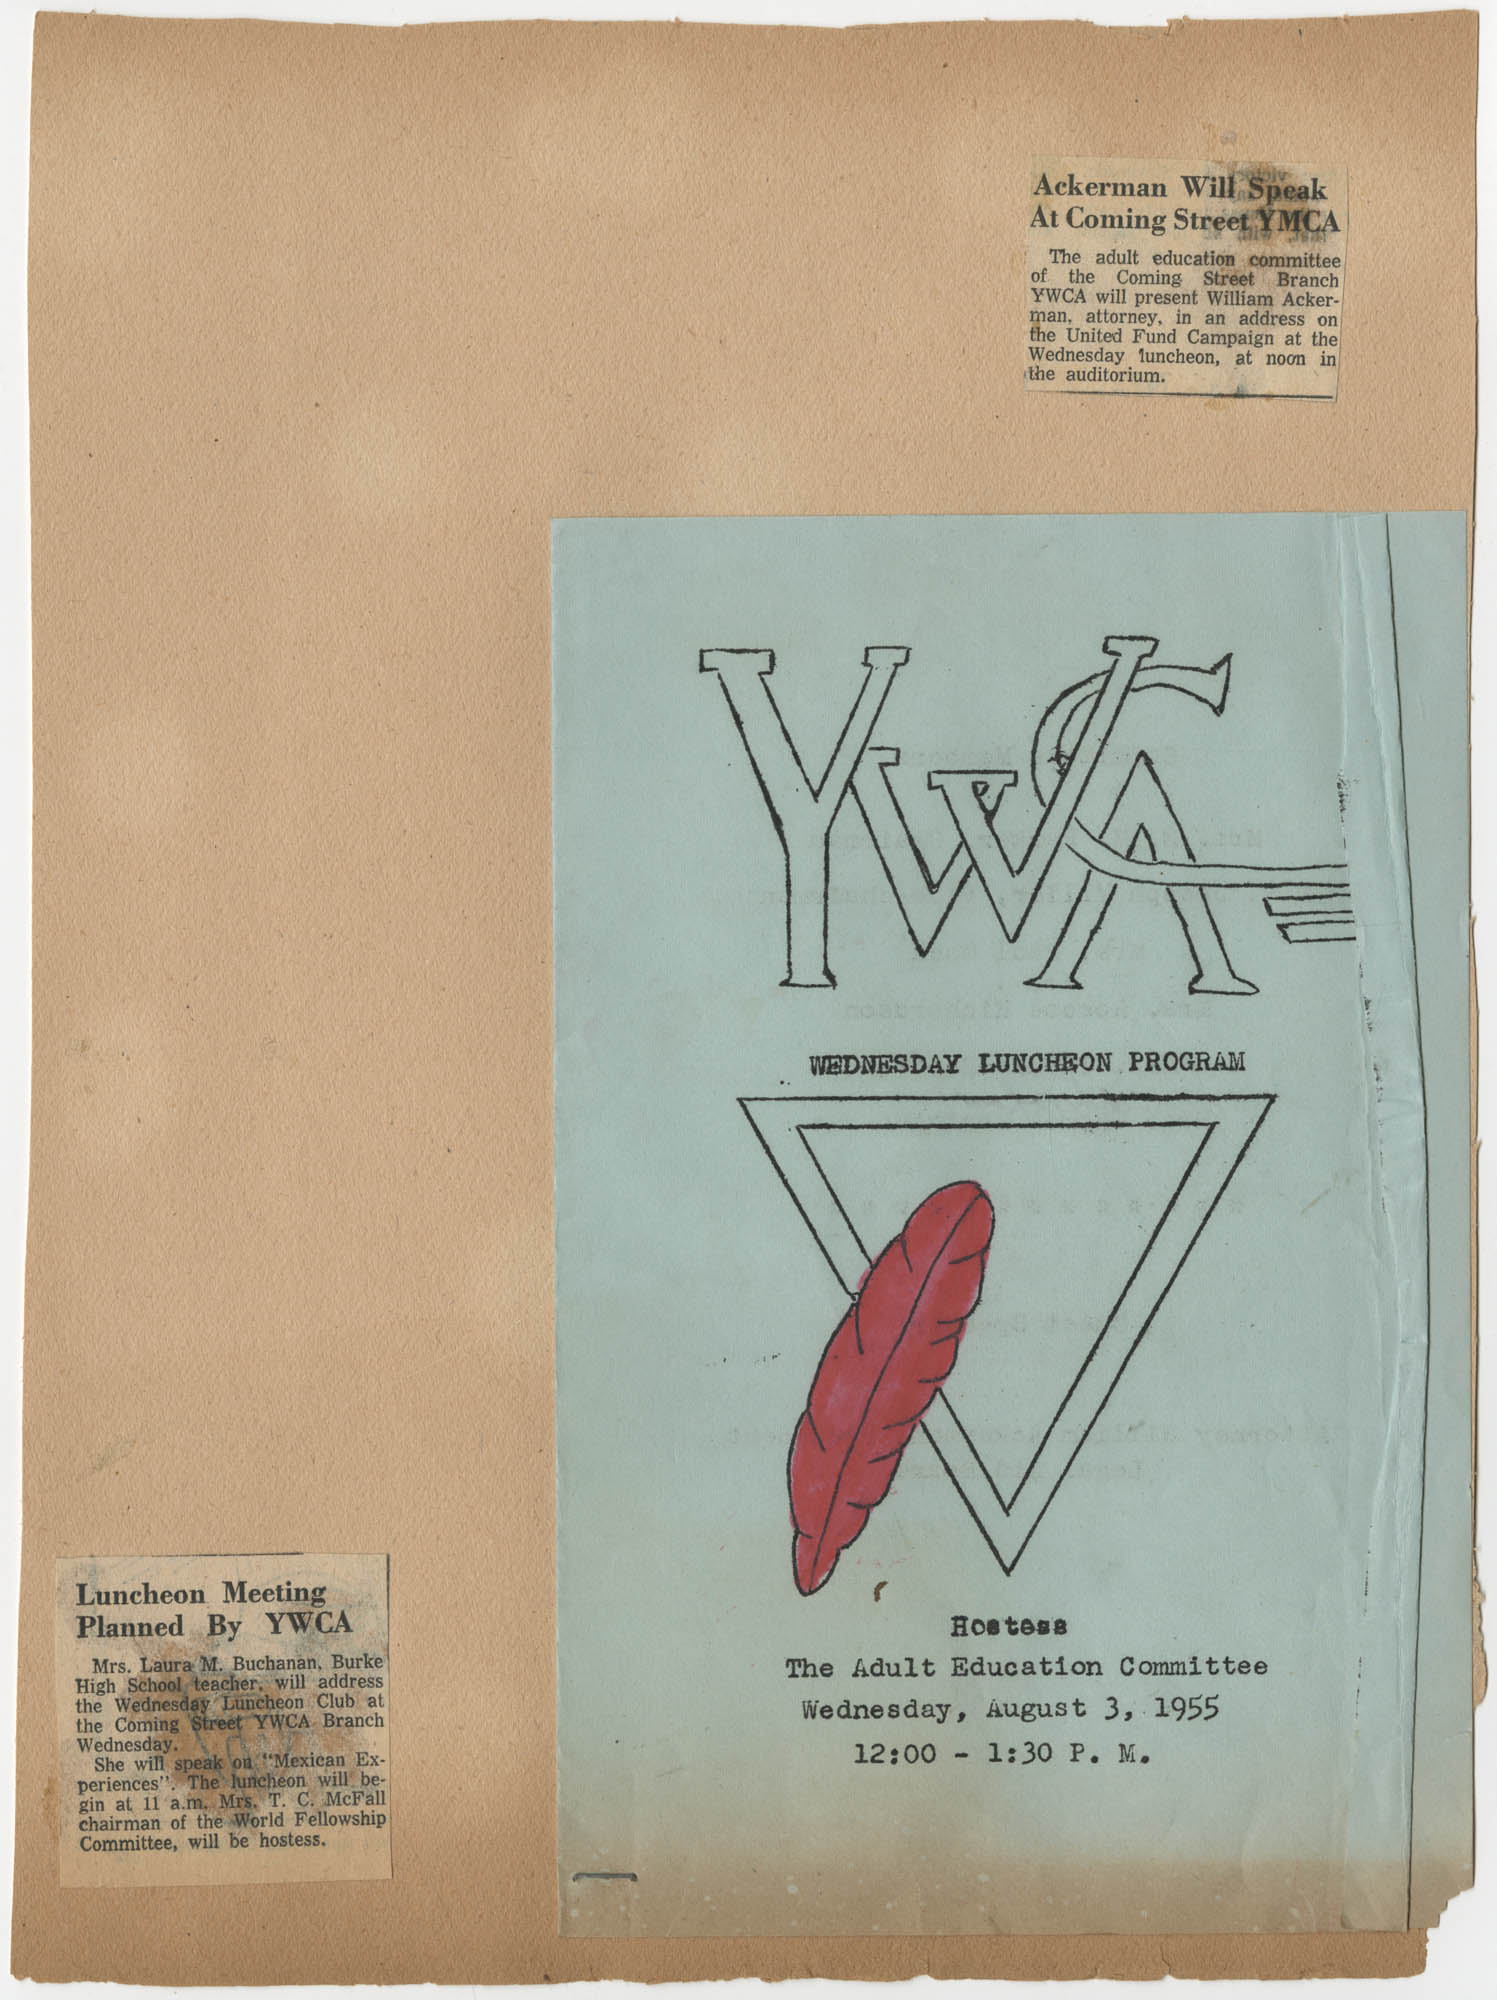 Coming Street Y.W.C.A. Scrapbook, 1953-1957, Page 35 Exterior